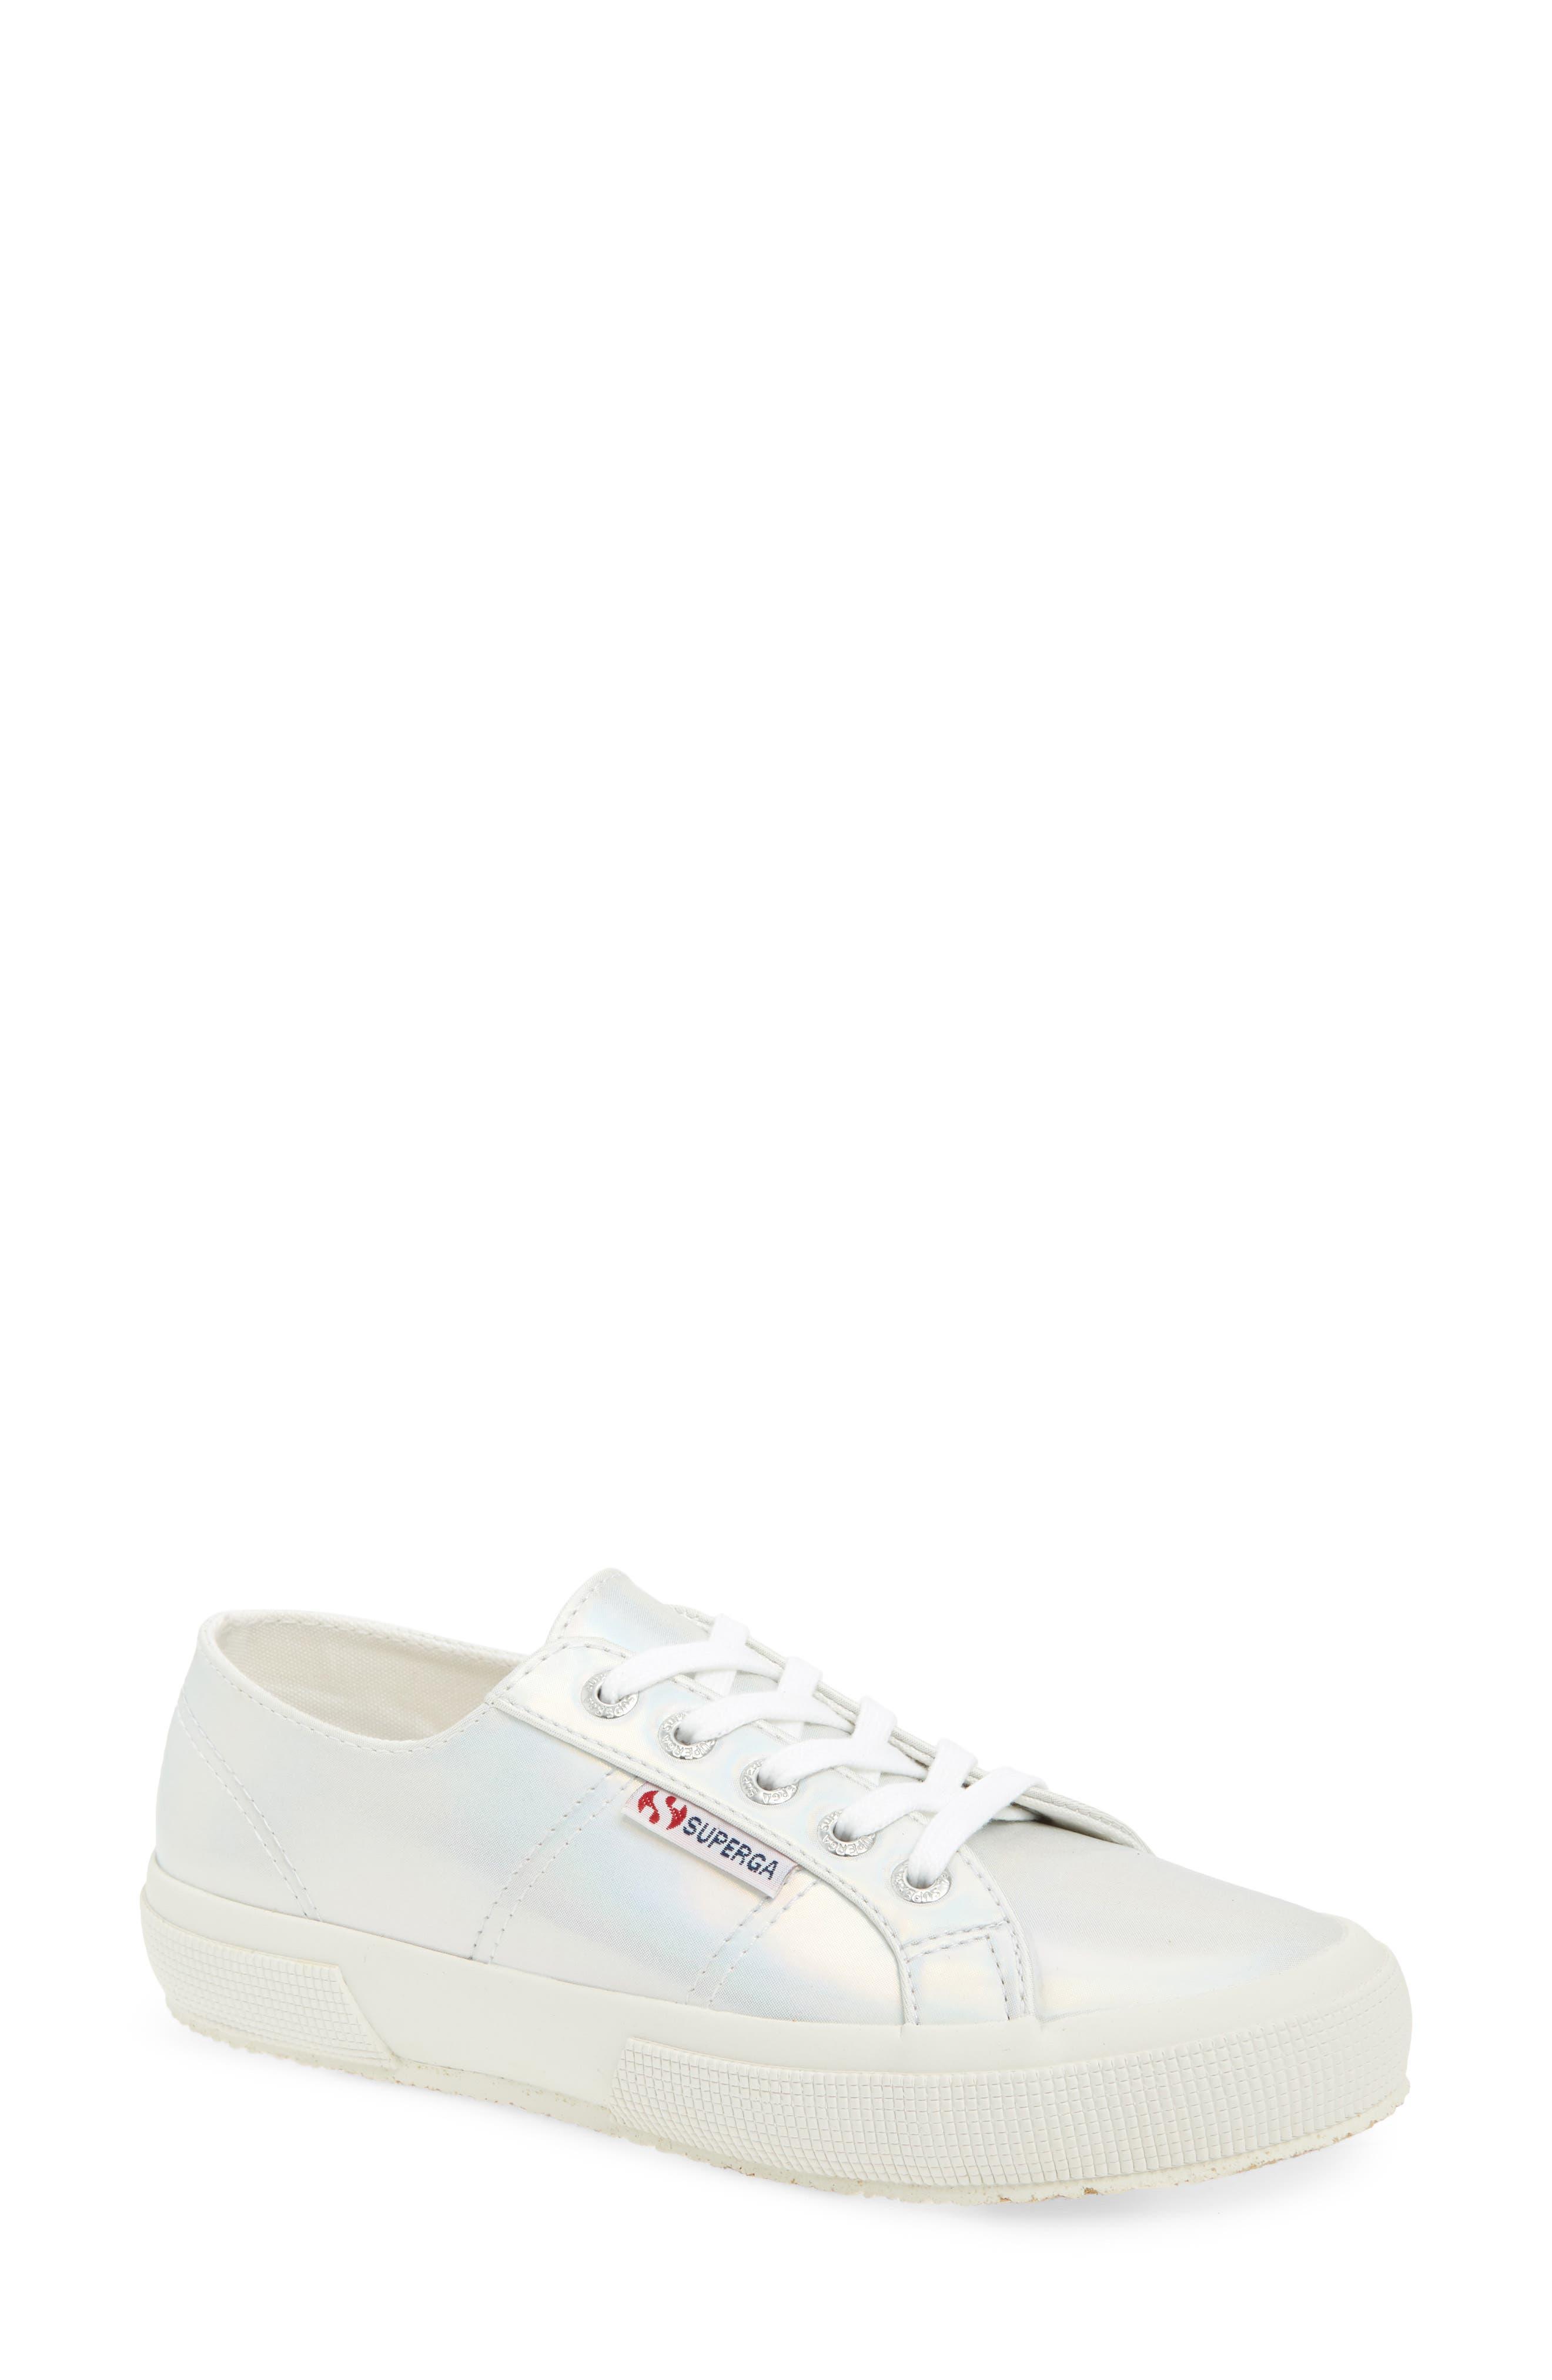 2750 Hologramw Low Top Sneaker,                             Main thumbnail 1, color,                             Iridescent